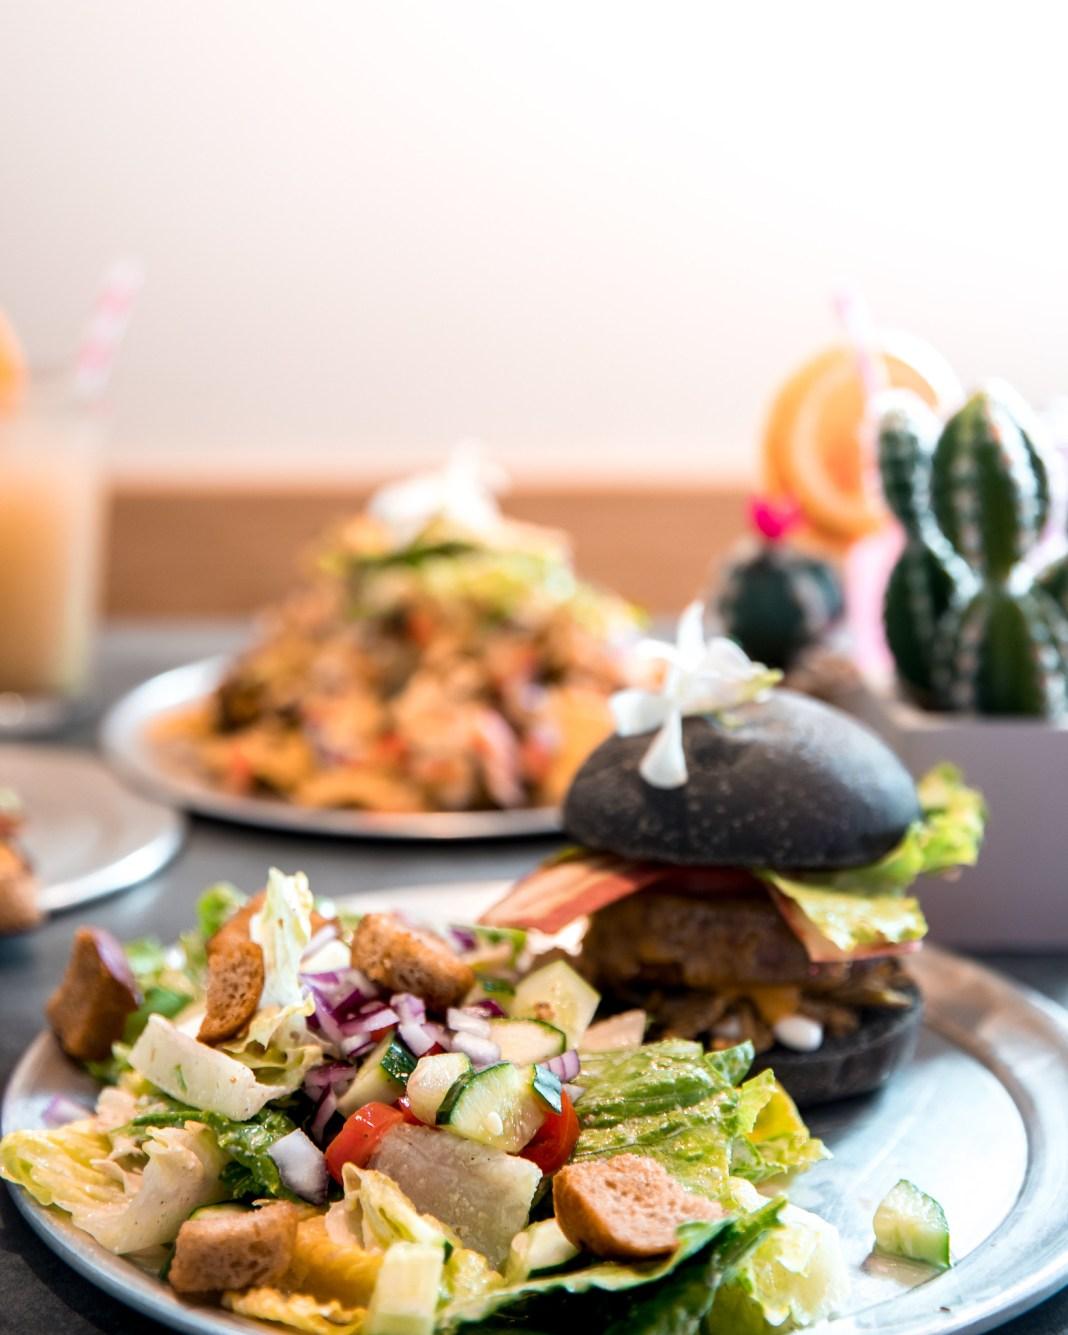 VIBE CAFE & HEALTH BAR - Vegan Food Big Island